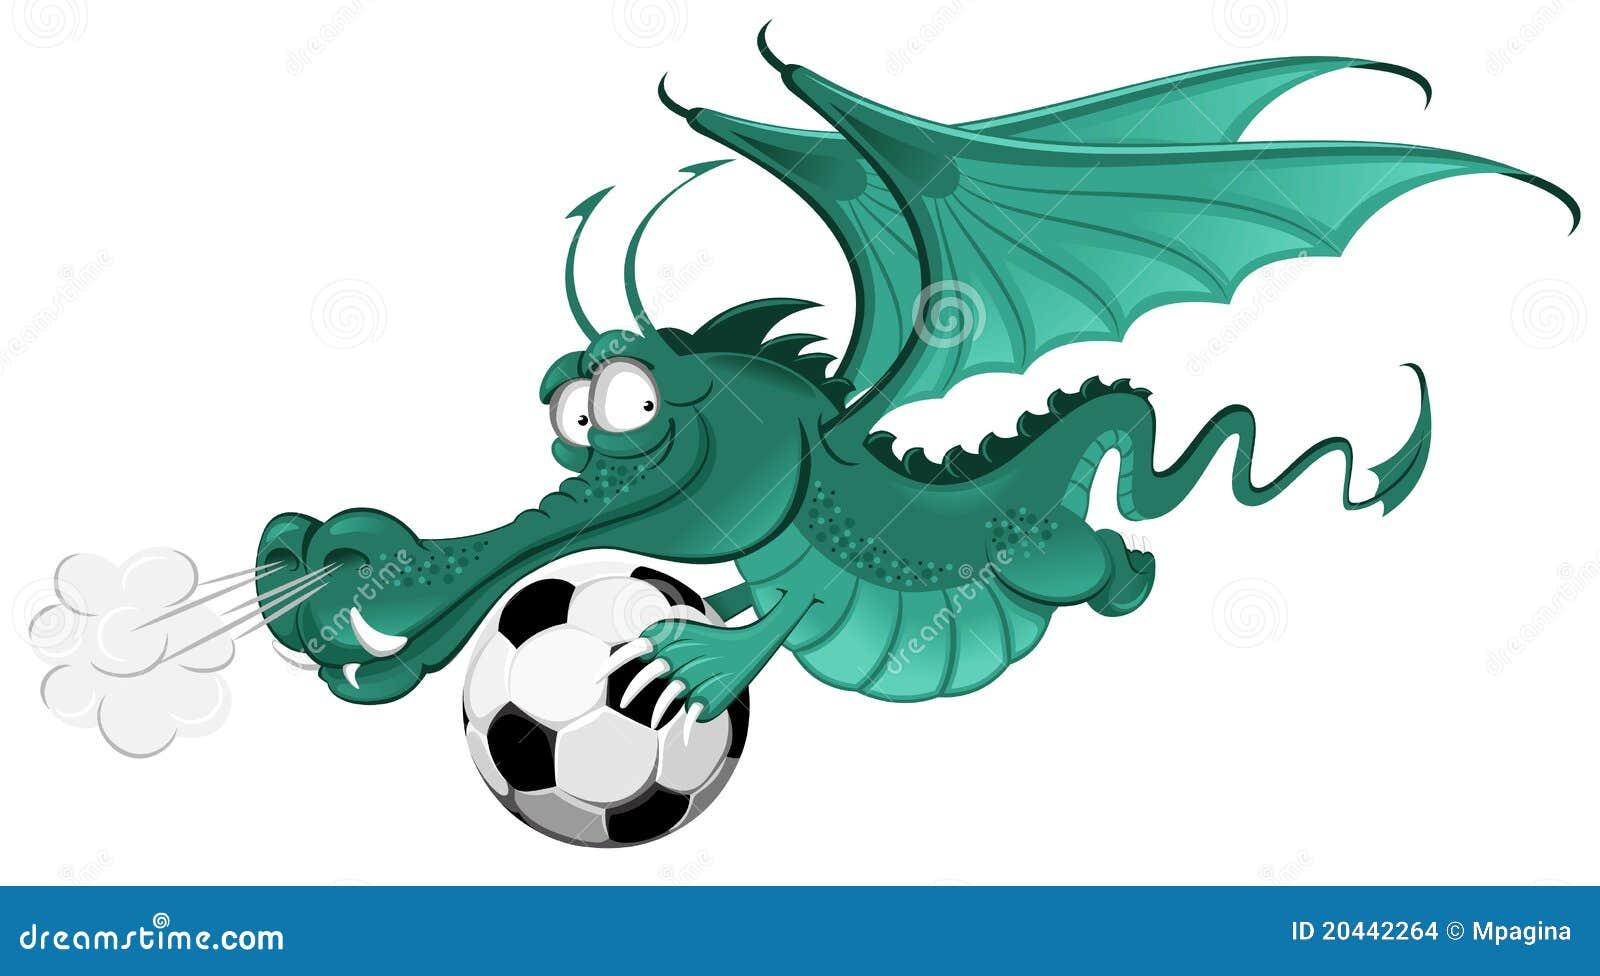 Dragon And Soccer Ball Stock Vector. Image Of Magic